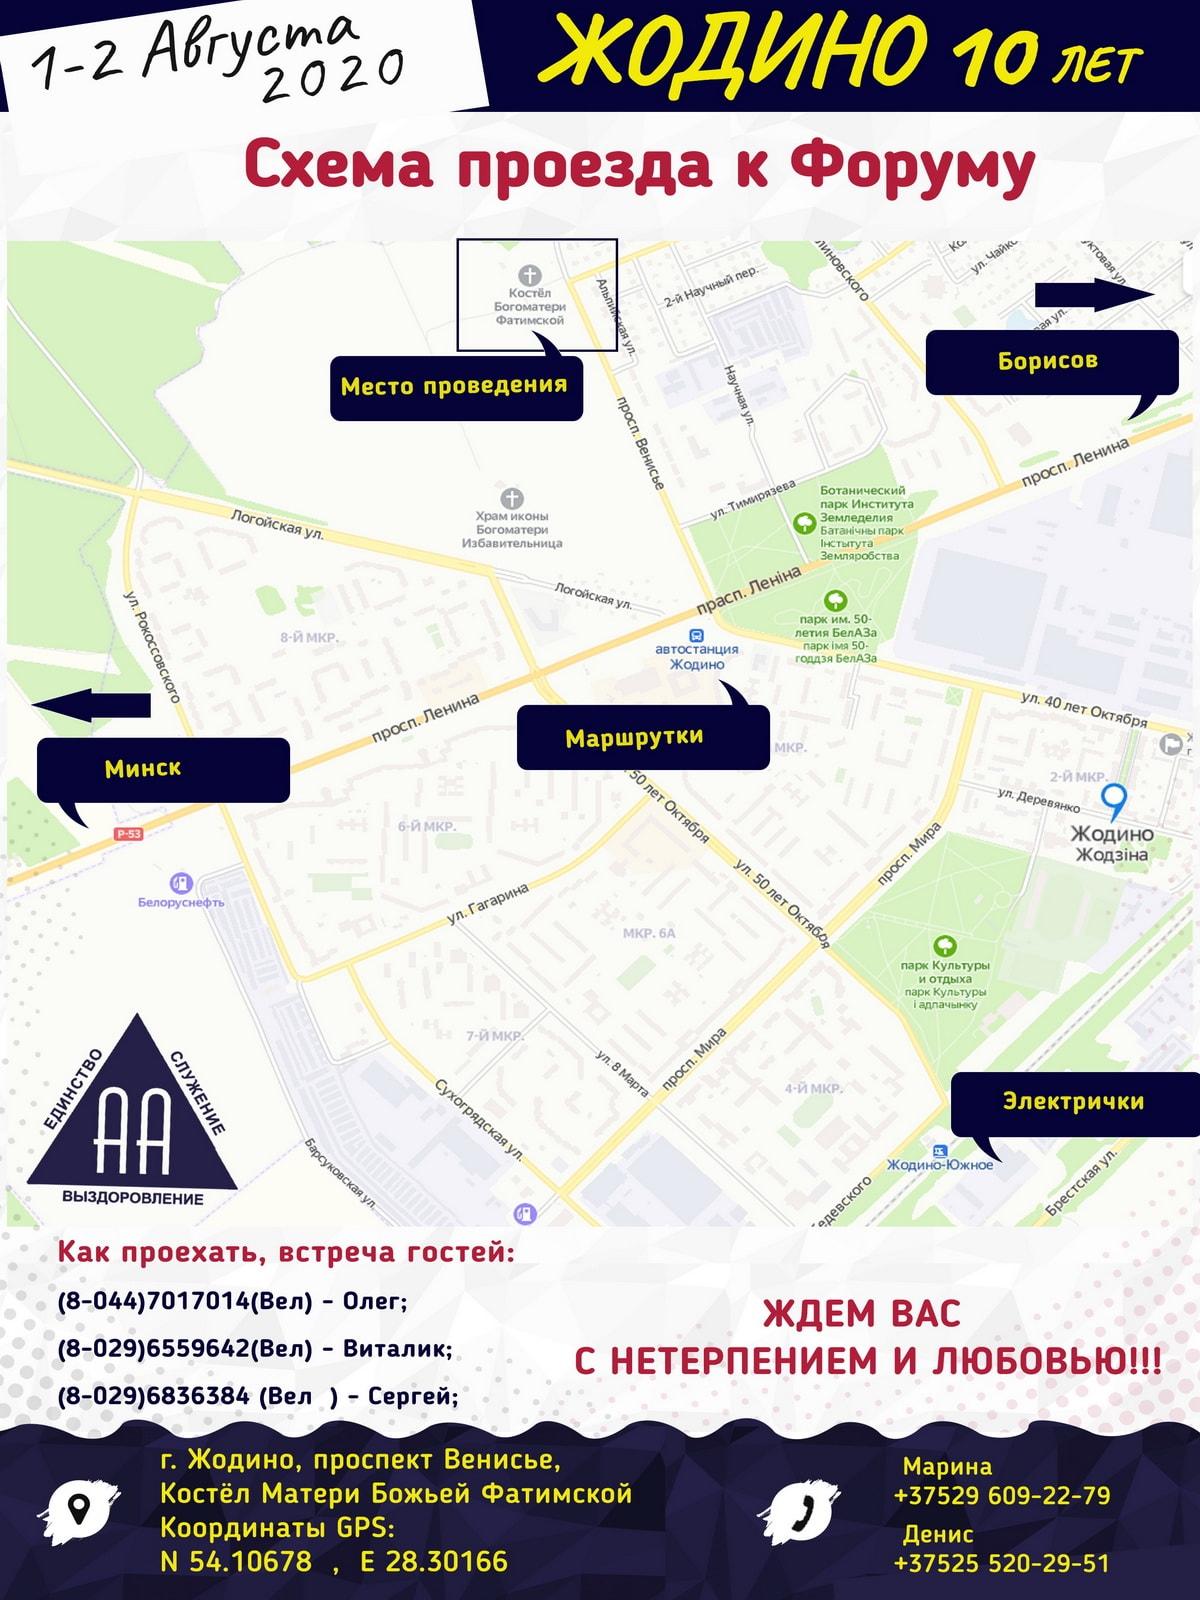 Карта (схема) проезда на форум АА в Жодино